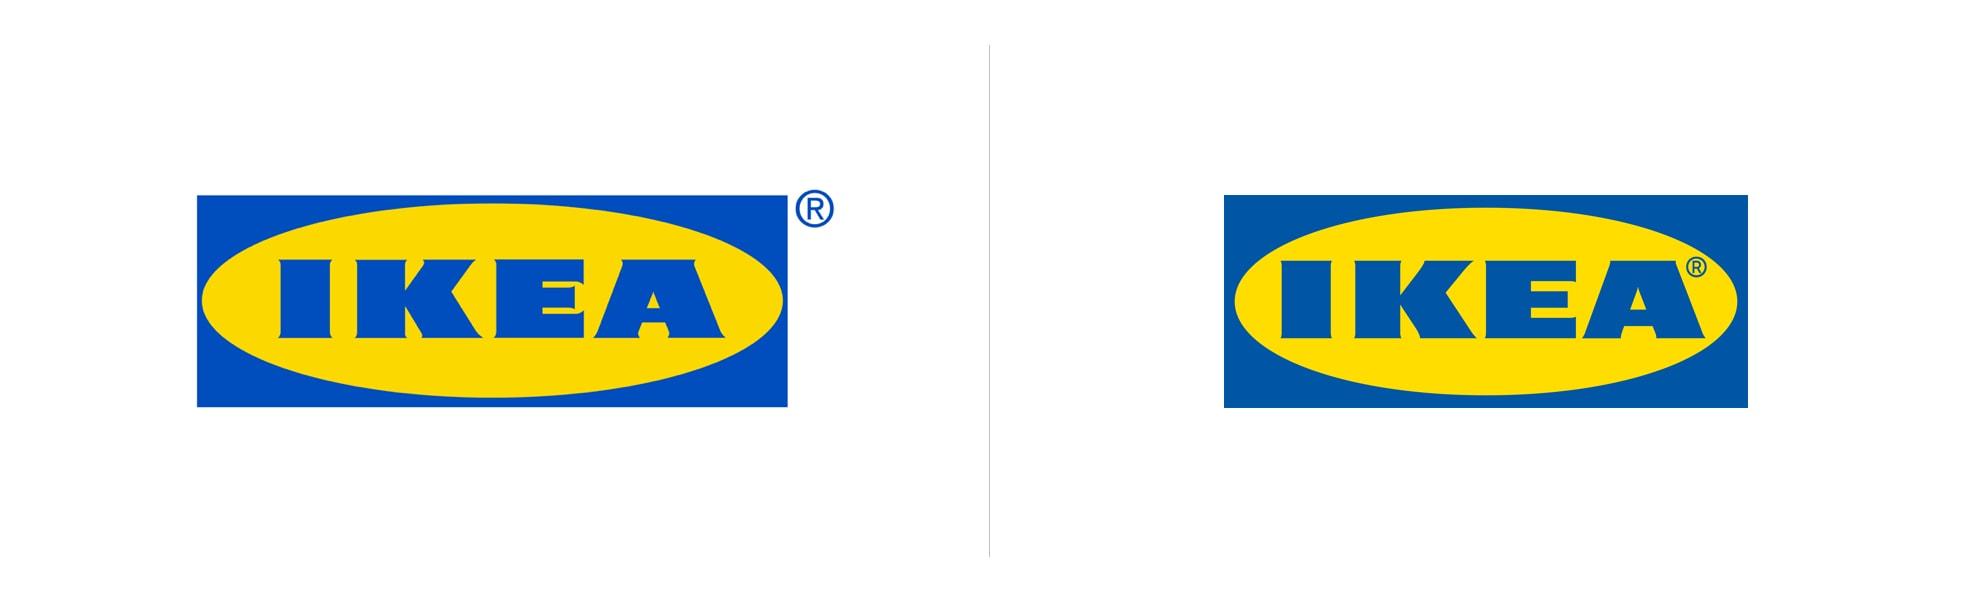 nowe istare logo ikea